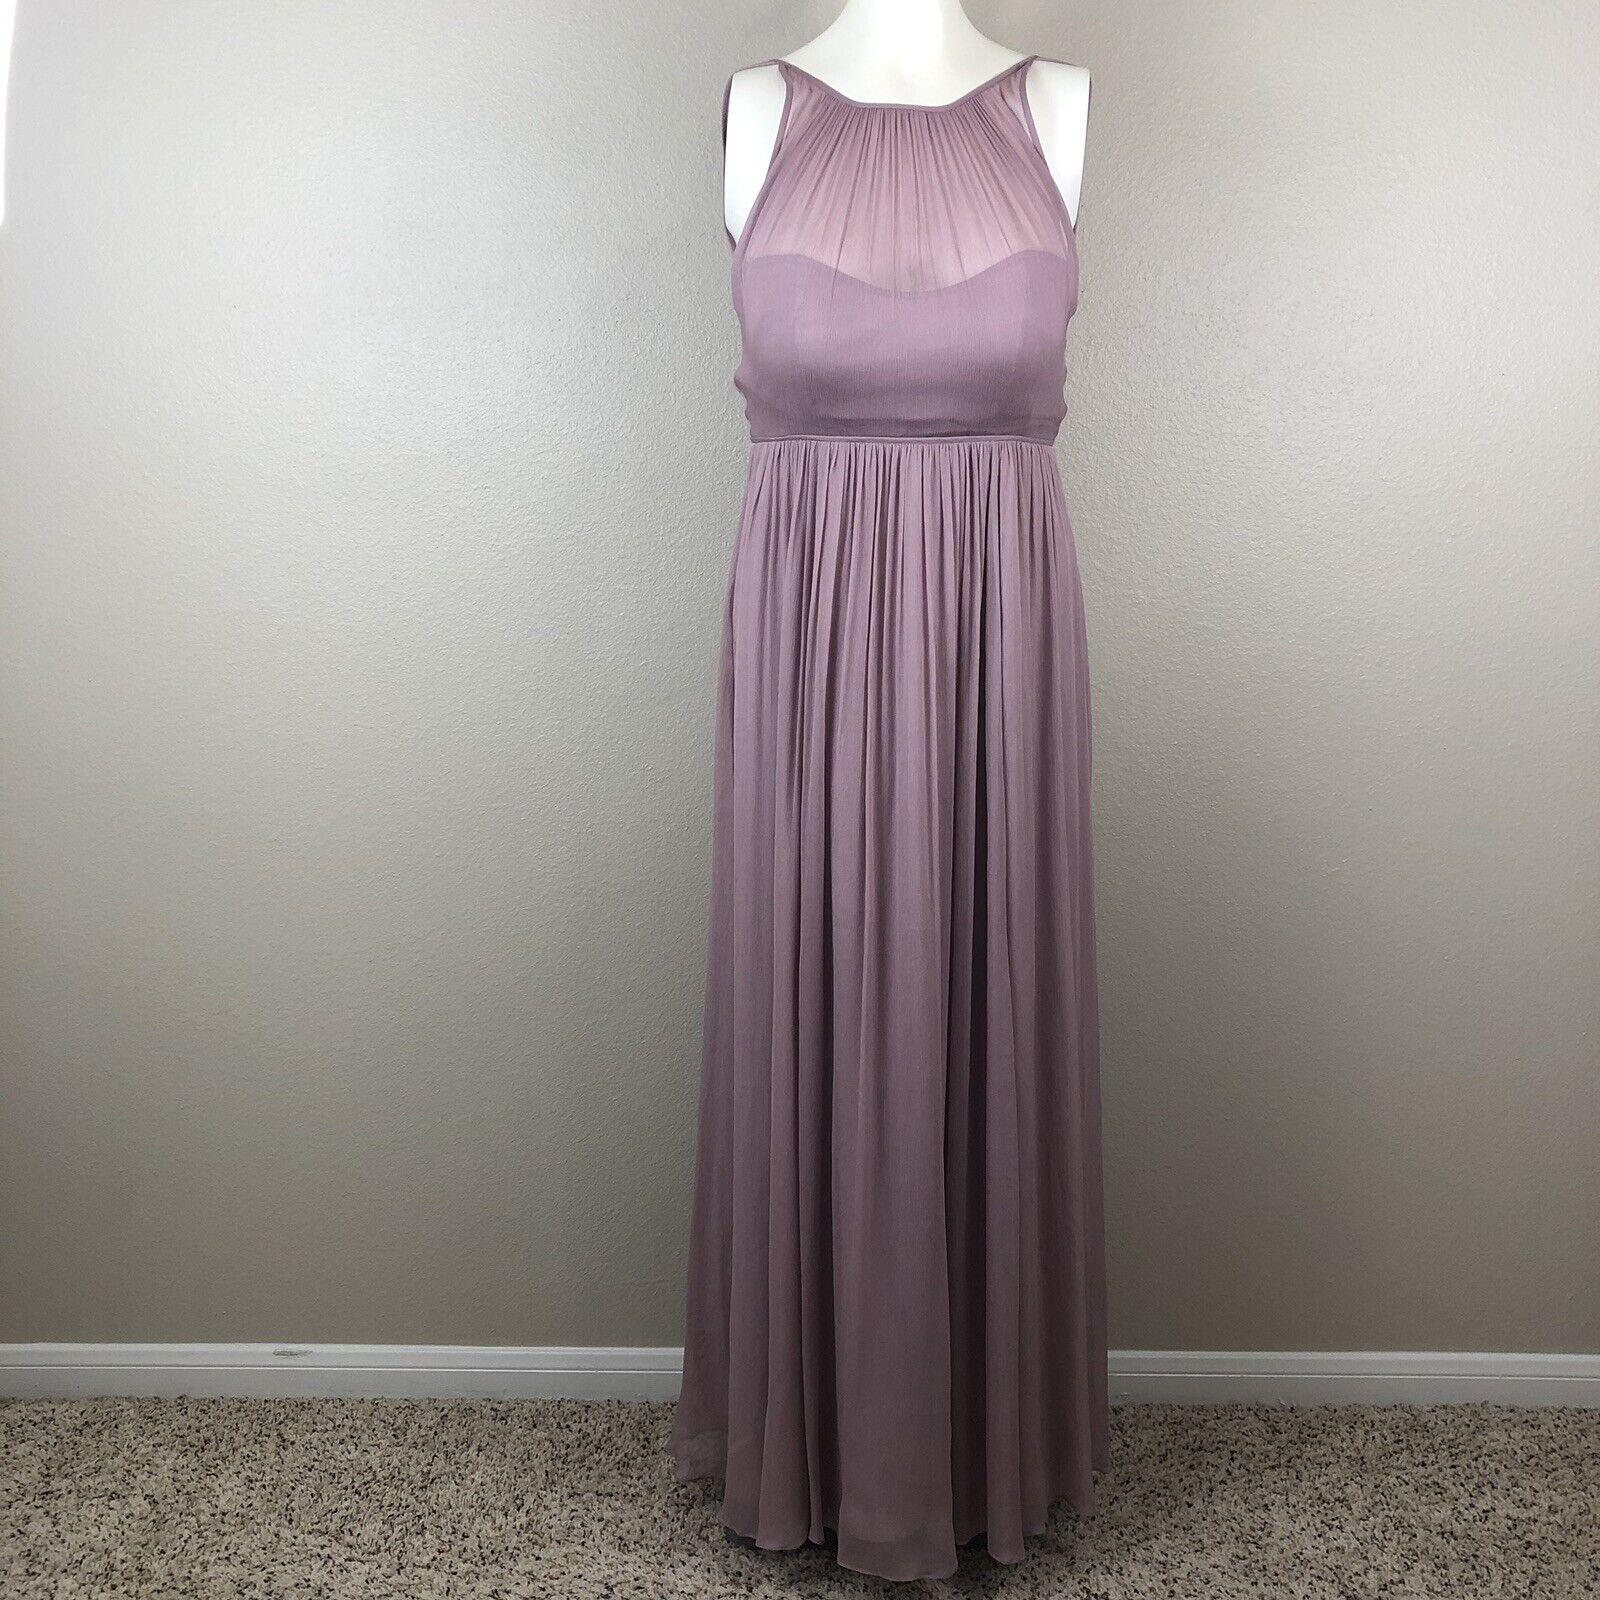 J.Crew Woherren Maxi Dress Rosa Bridal Bridesmaid Gauze Pockets Lined Padded Sz 6